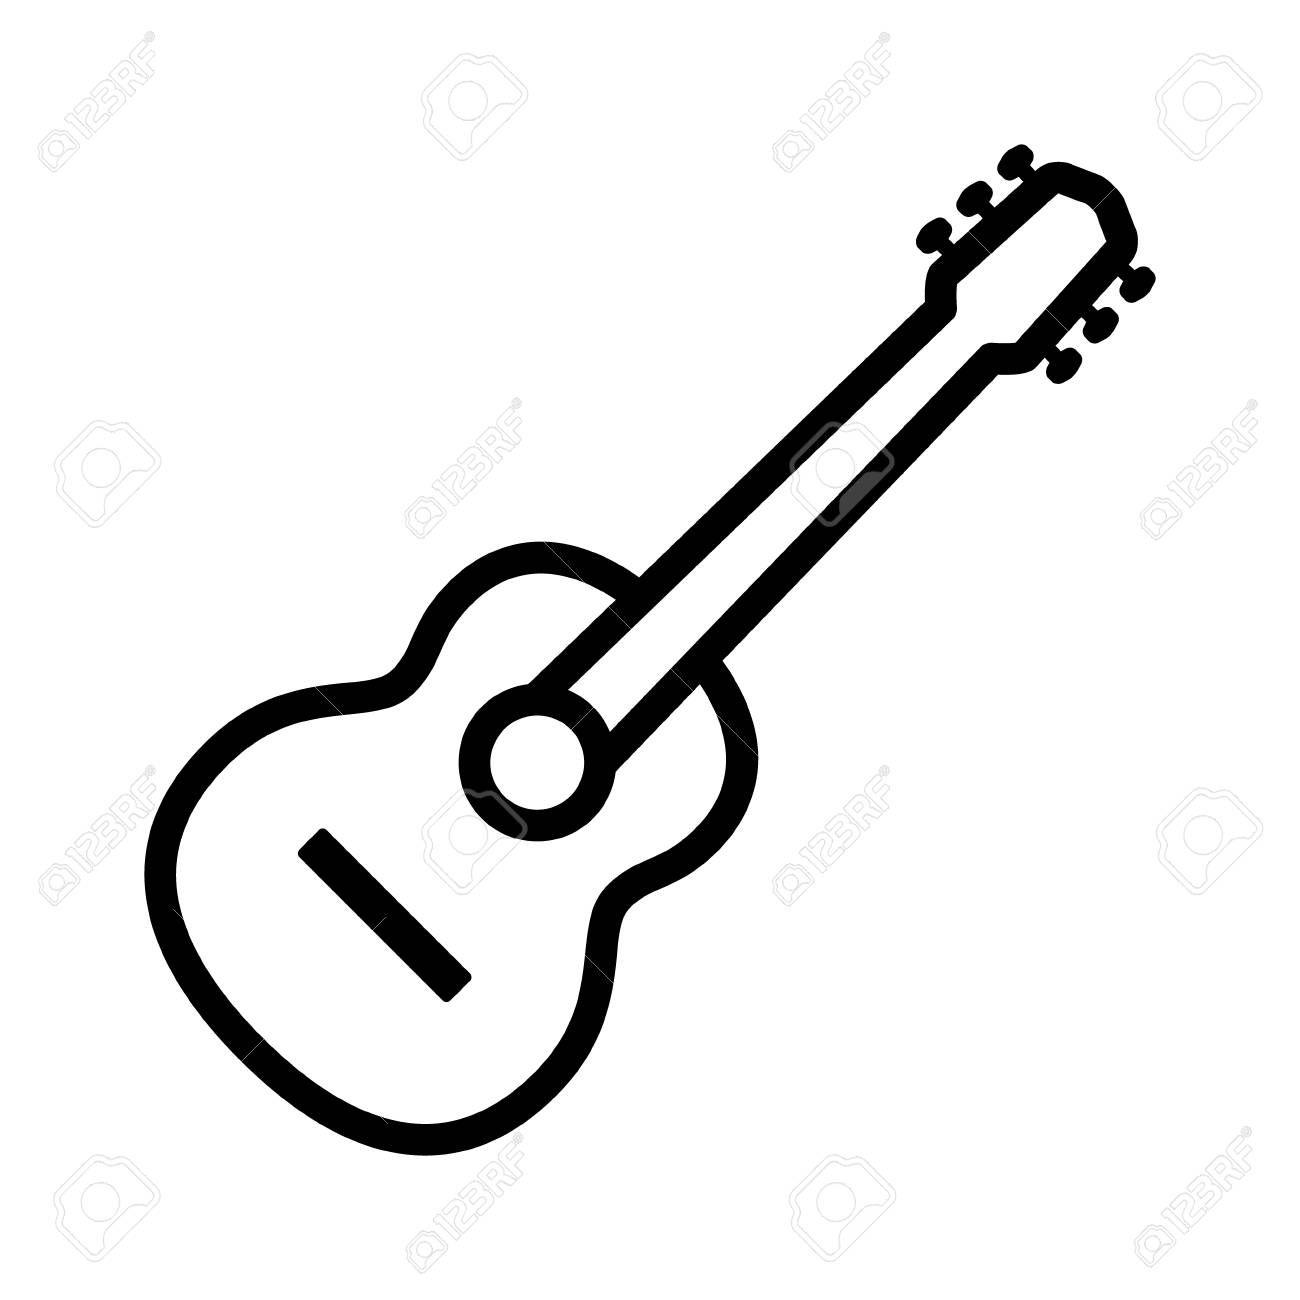 Acoustic Guitar Musical Instrument Line Art Icon For Music Apps Art Icon Guitar Doodle Line Art